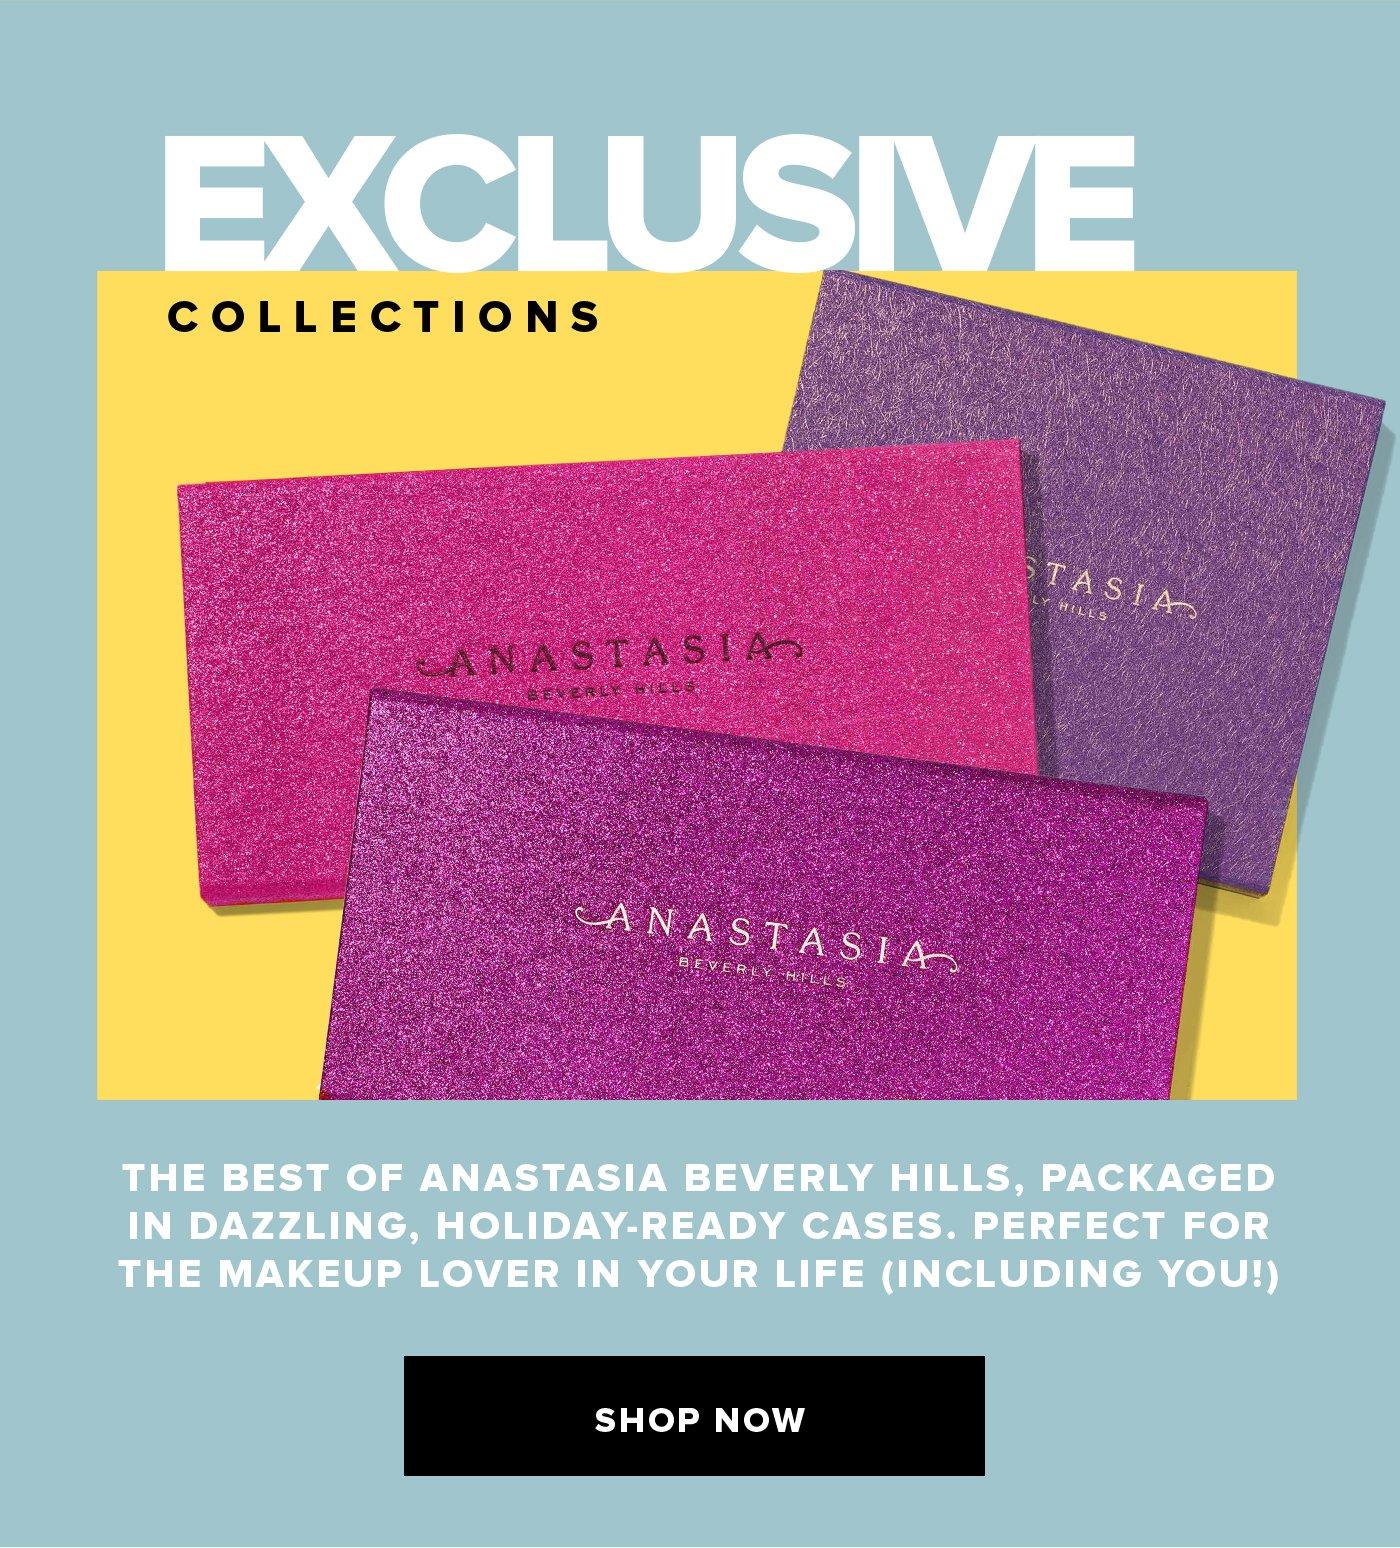 Ana Stasia & Co anastasia beverly hills: cyber monday: $30 palettes + $15